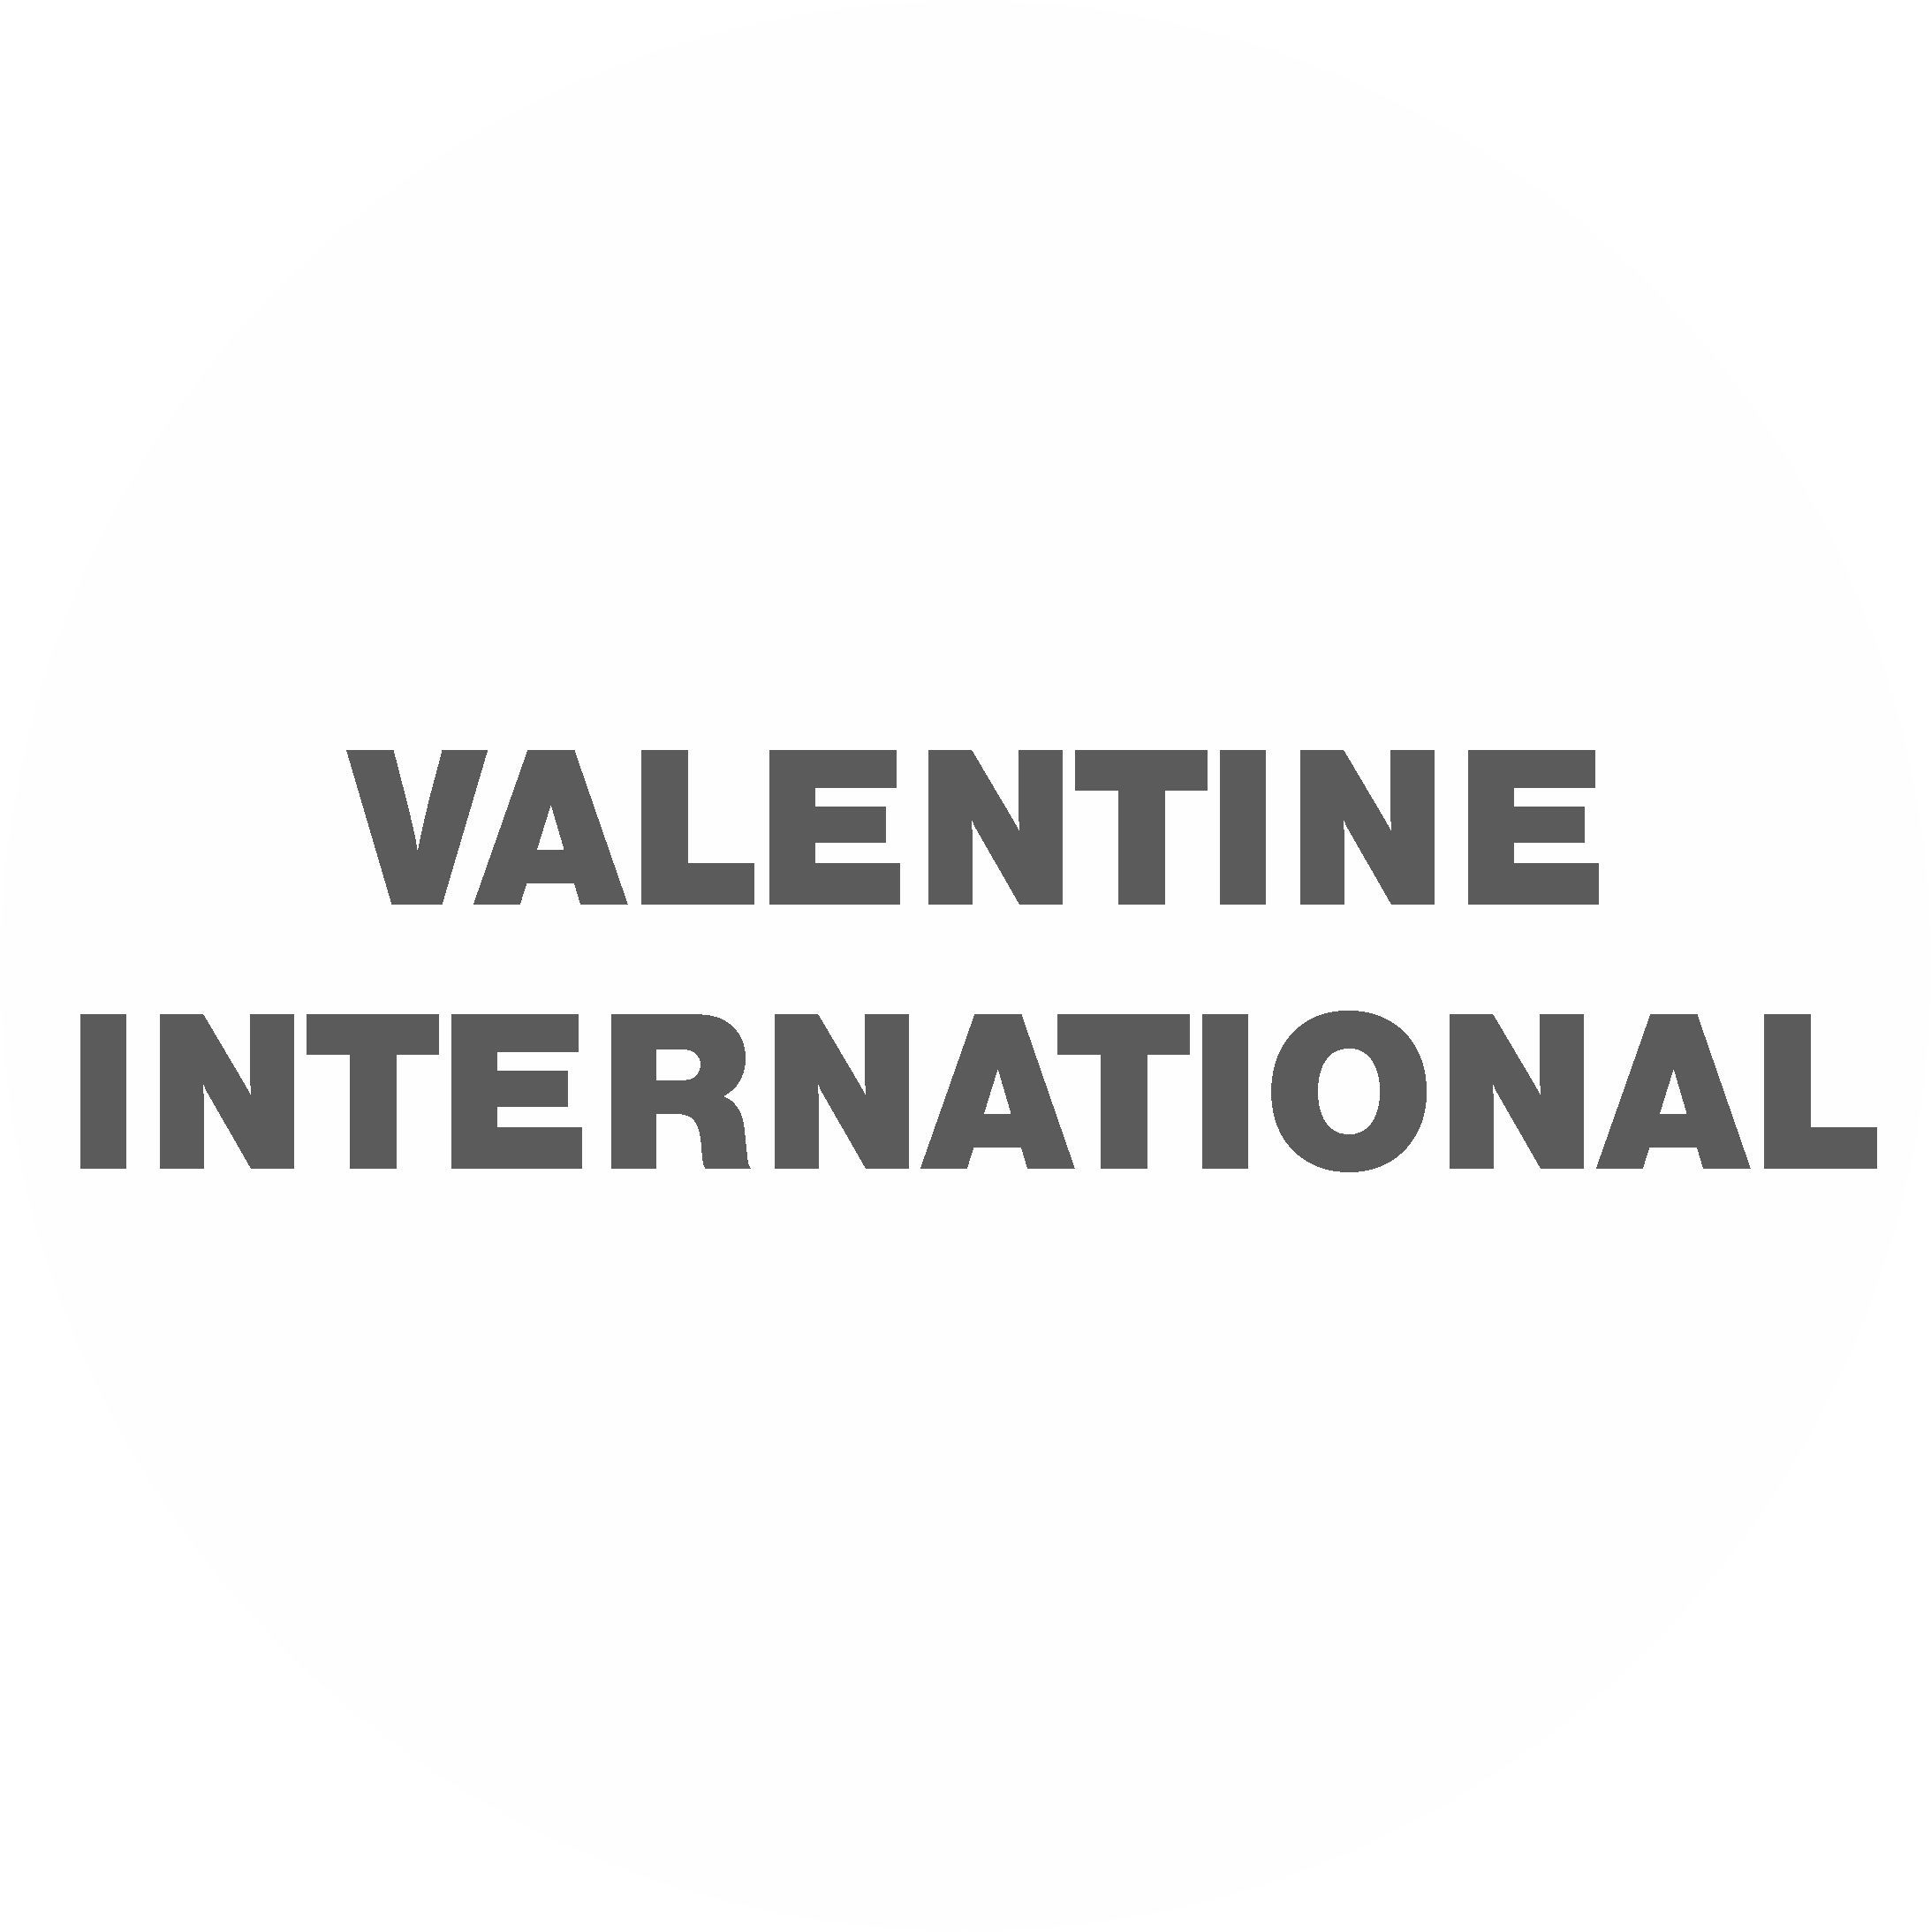 Ian Morrice- Valentine International